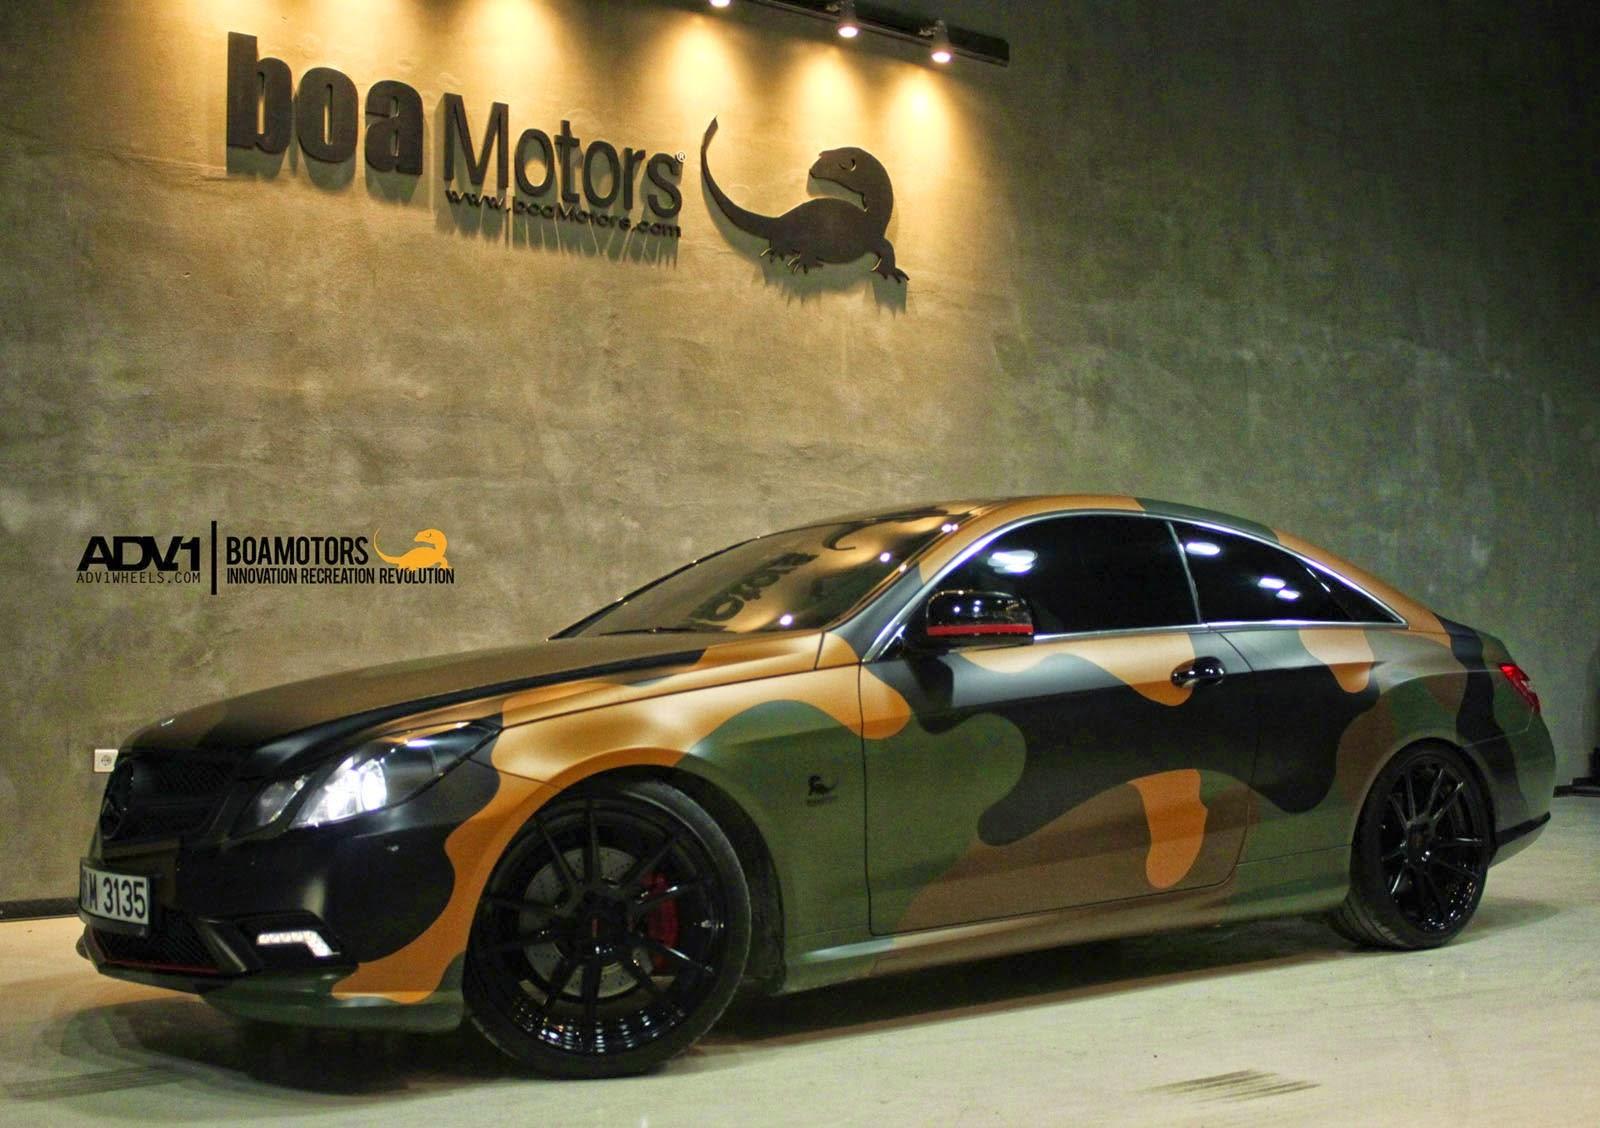 Mercedes Benz W207 E Class Coupe On Adv5 2mv2 Wheels